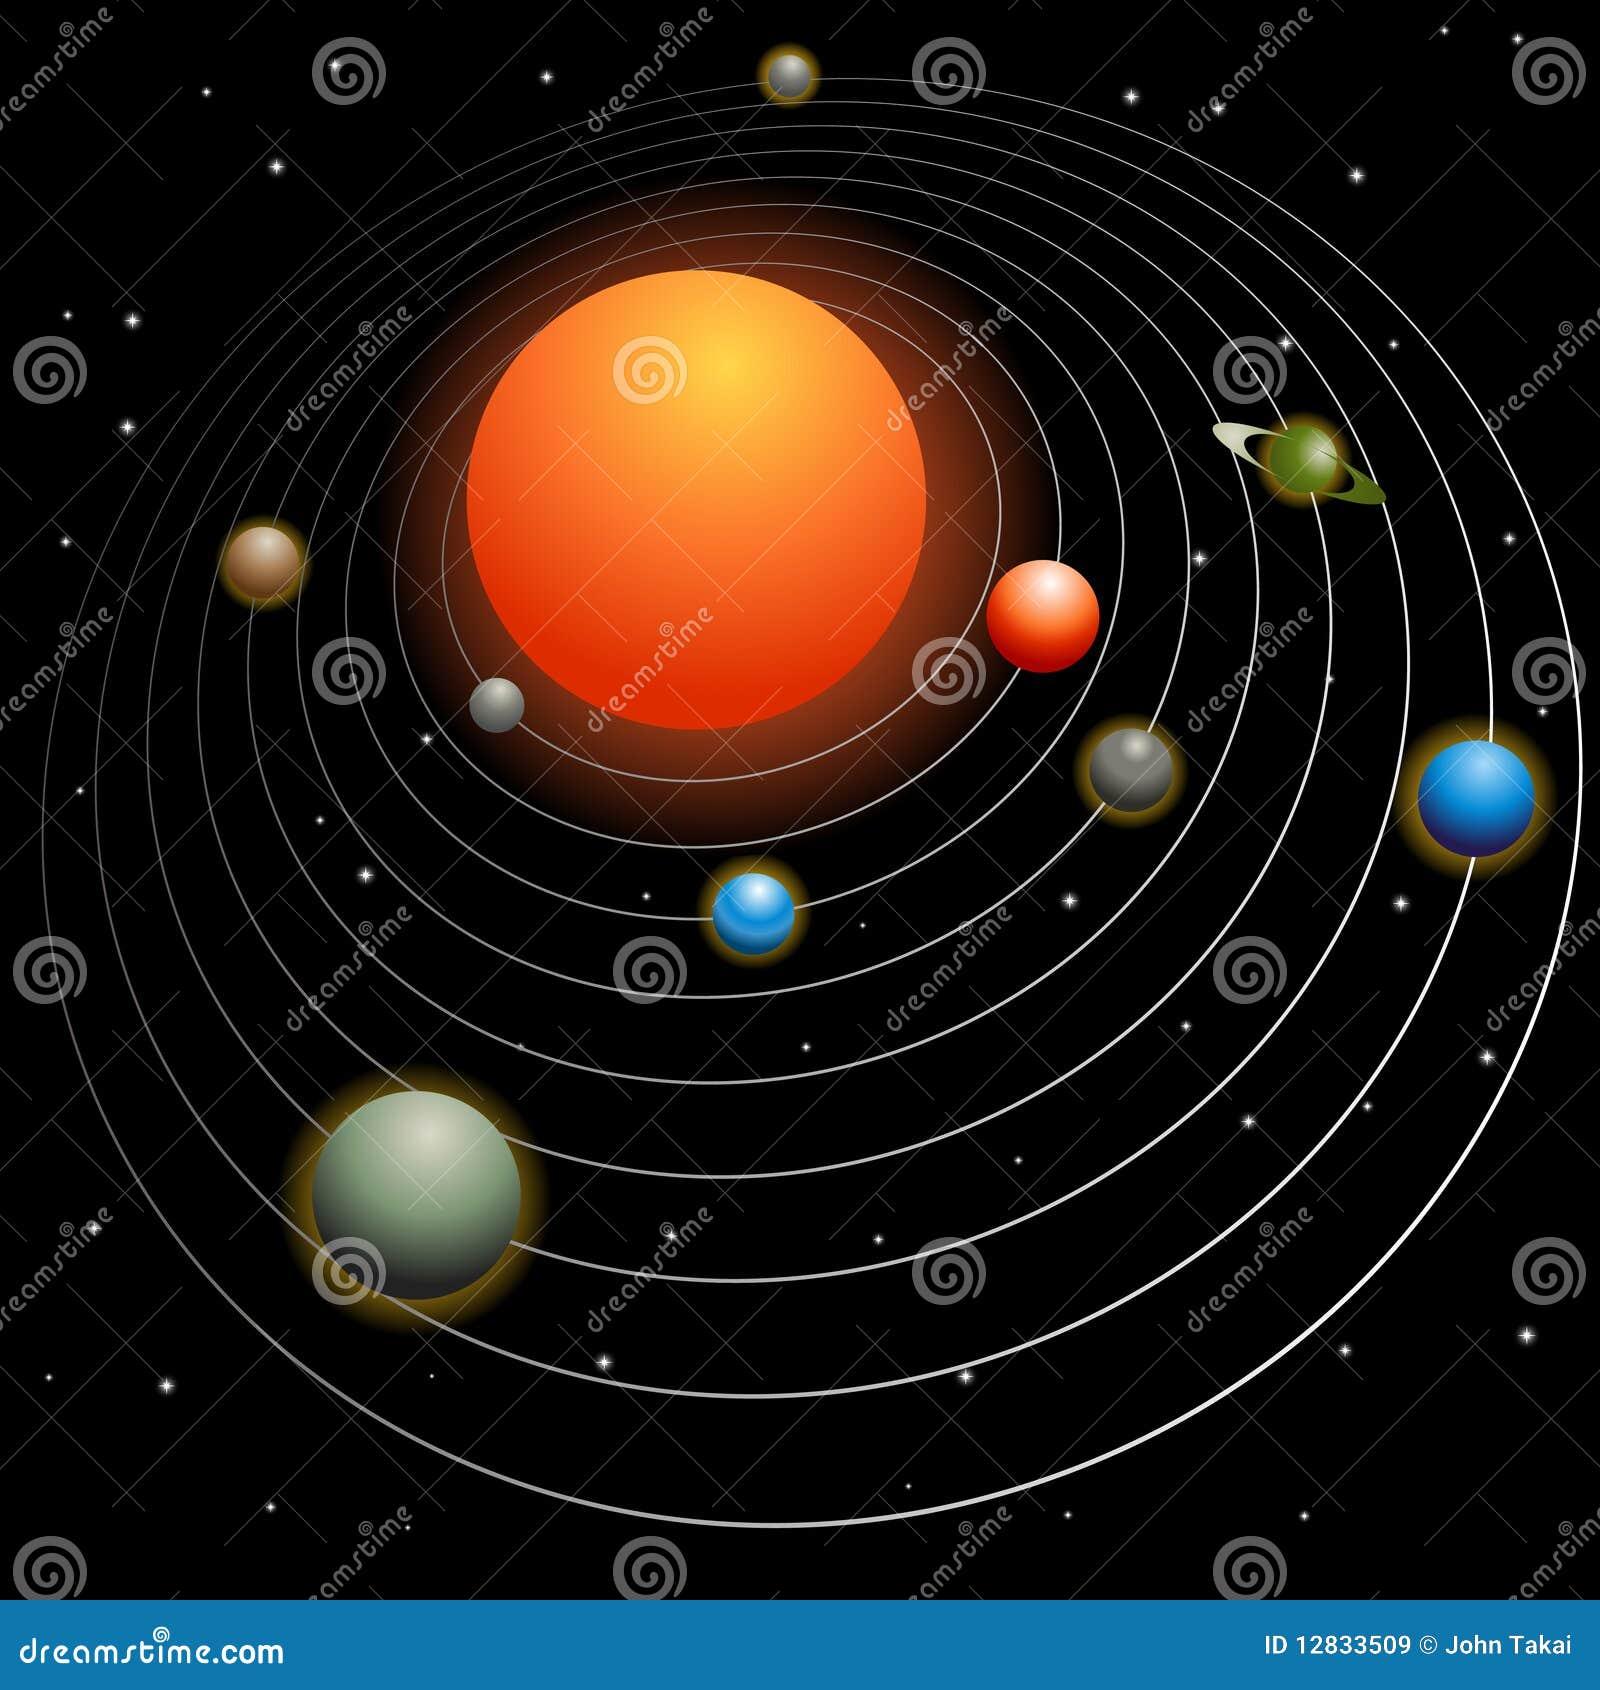 for solar system orbit lines - photo #45